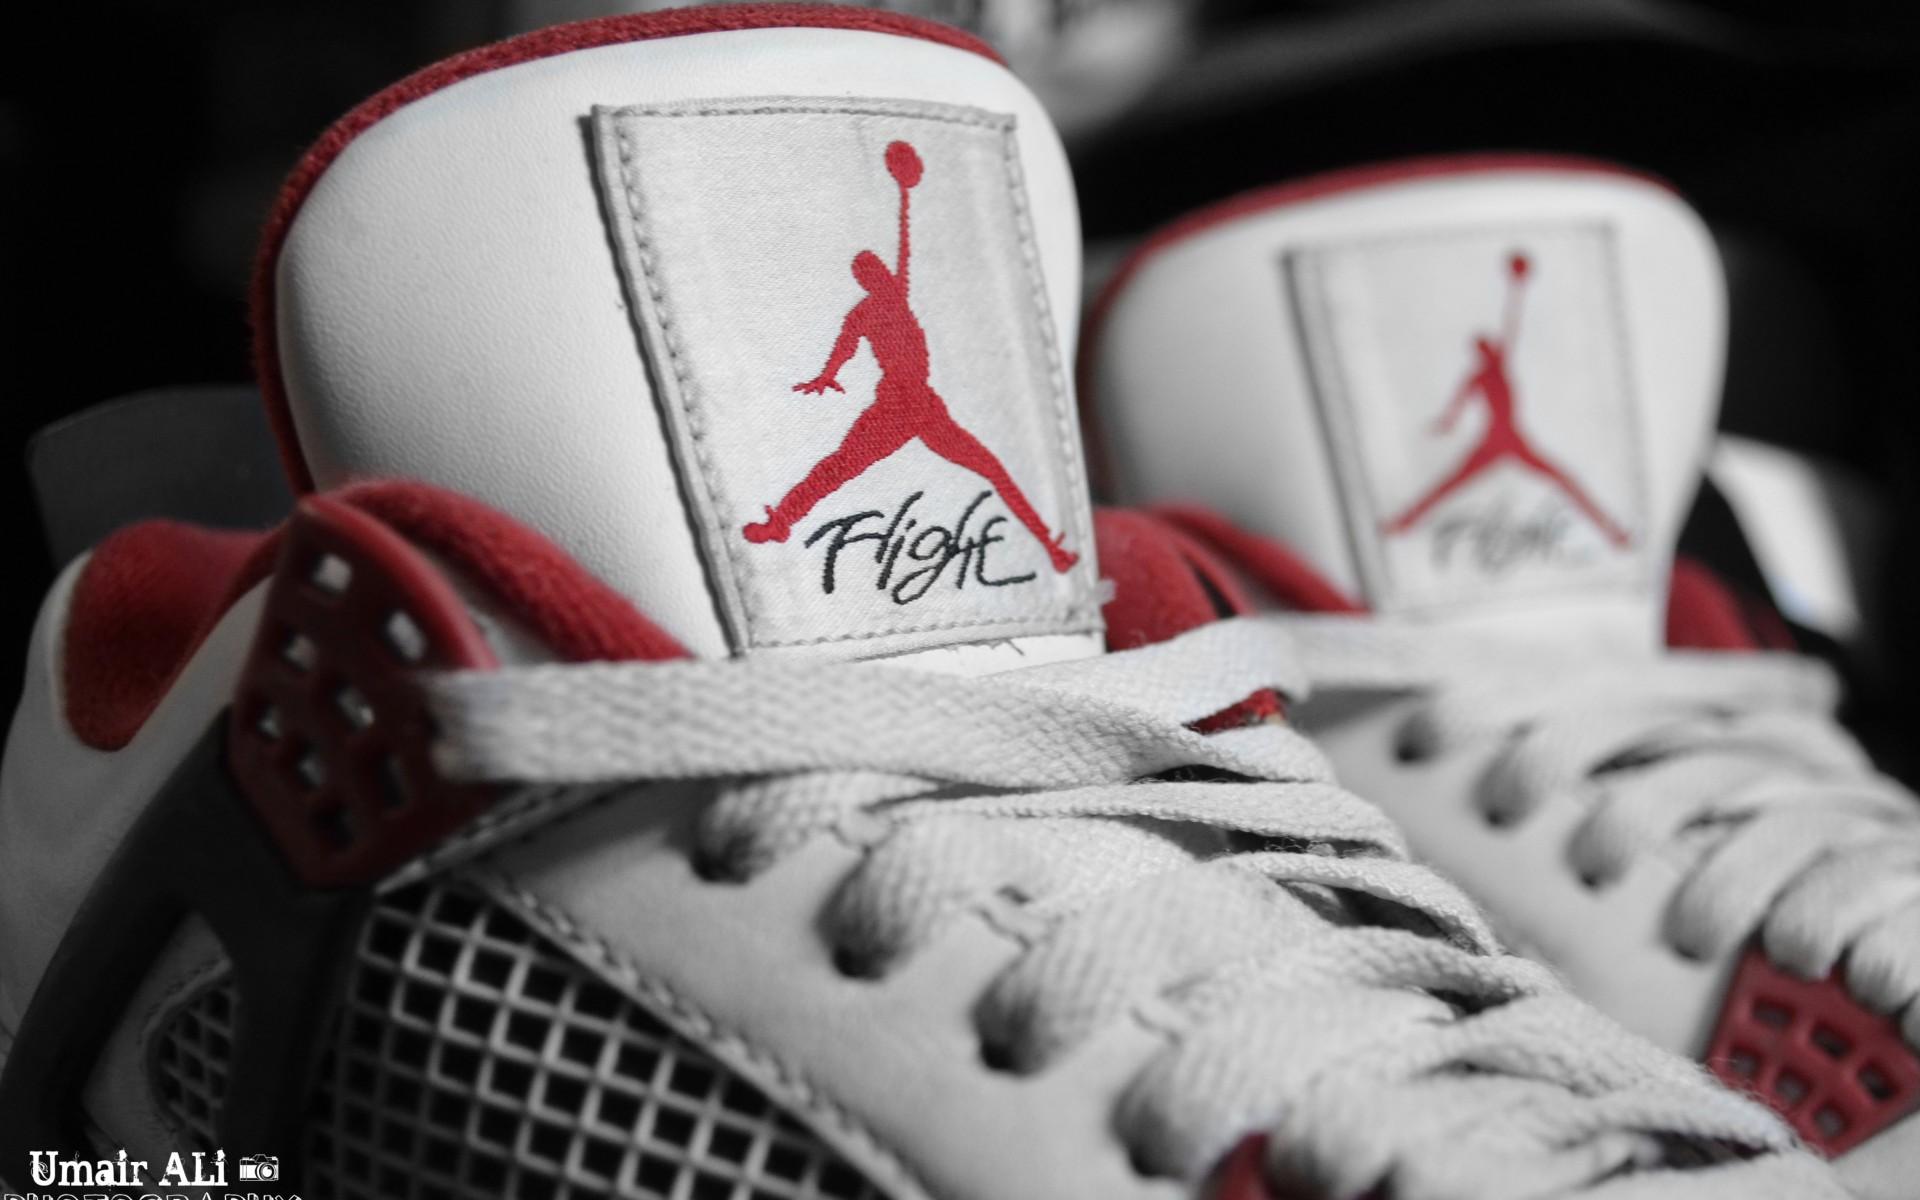 Free Download Air Jordan Wallpaper Hd Fond Ecran Hd